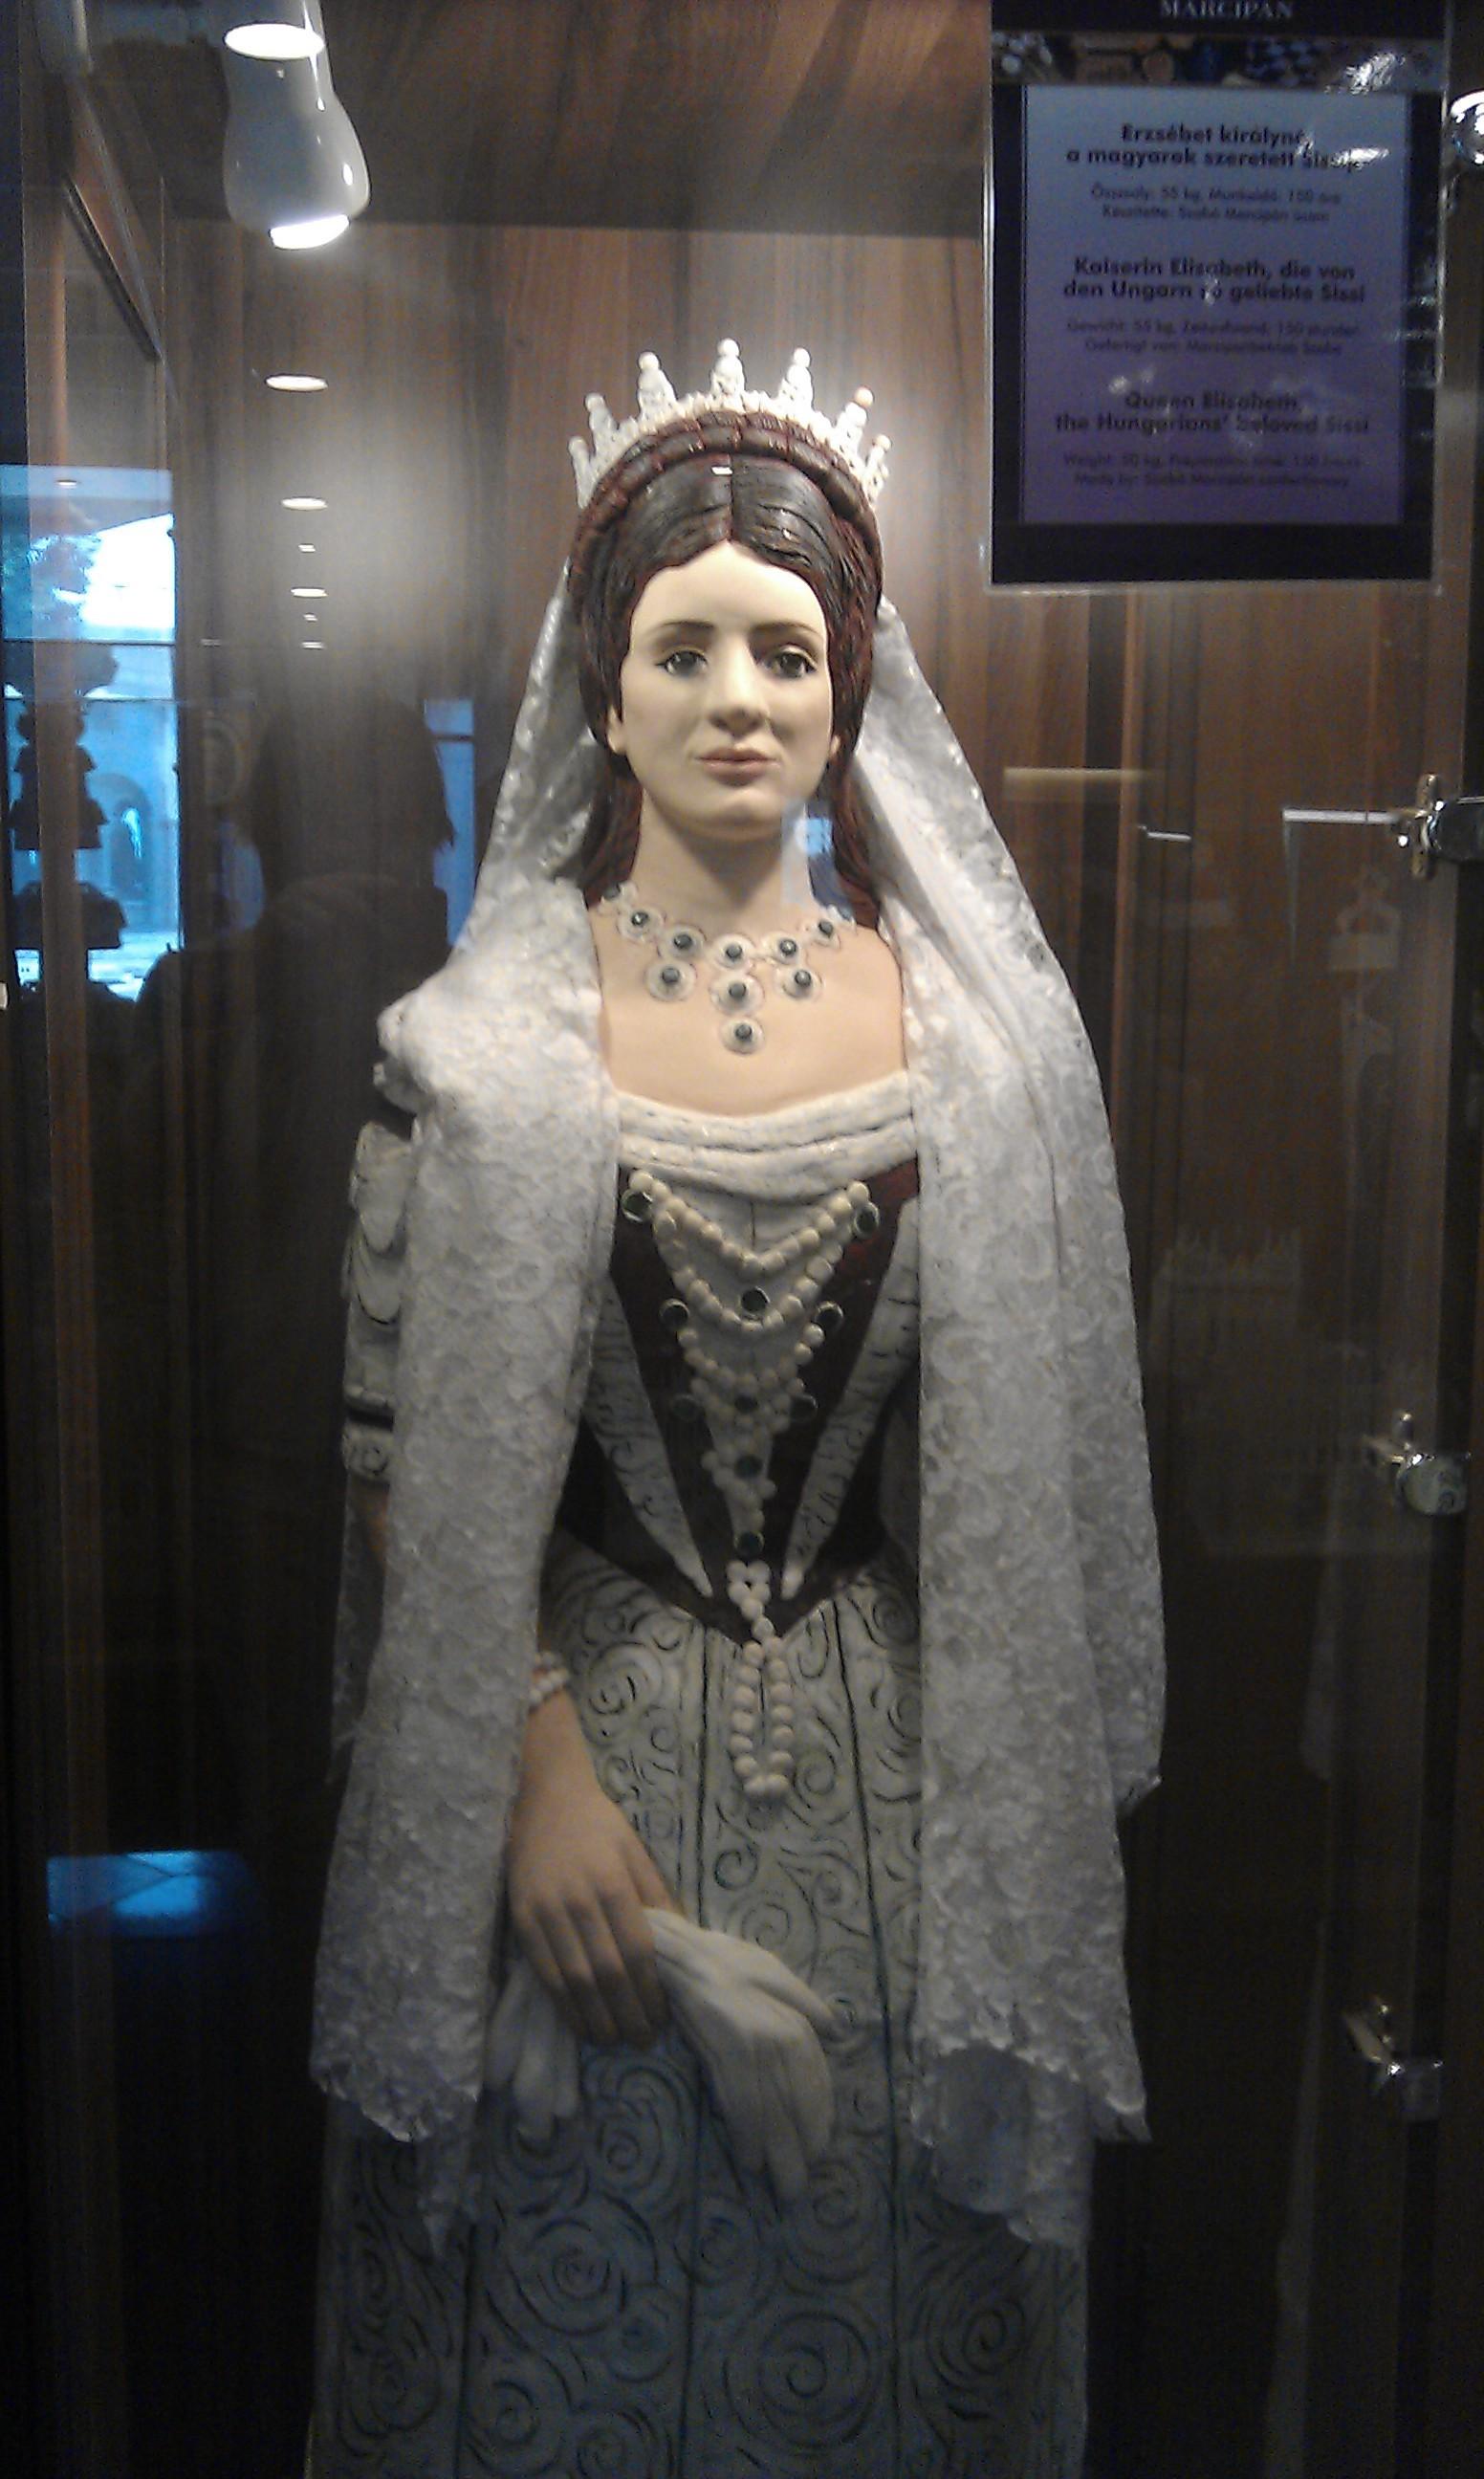 Adventures in Budapest Szarbo Marcipan Museum  Jacks